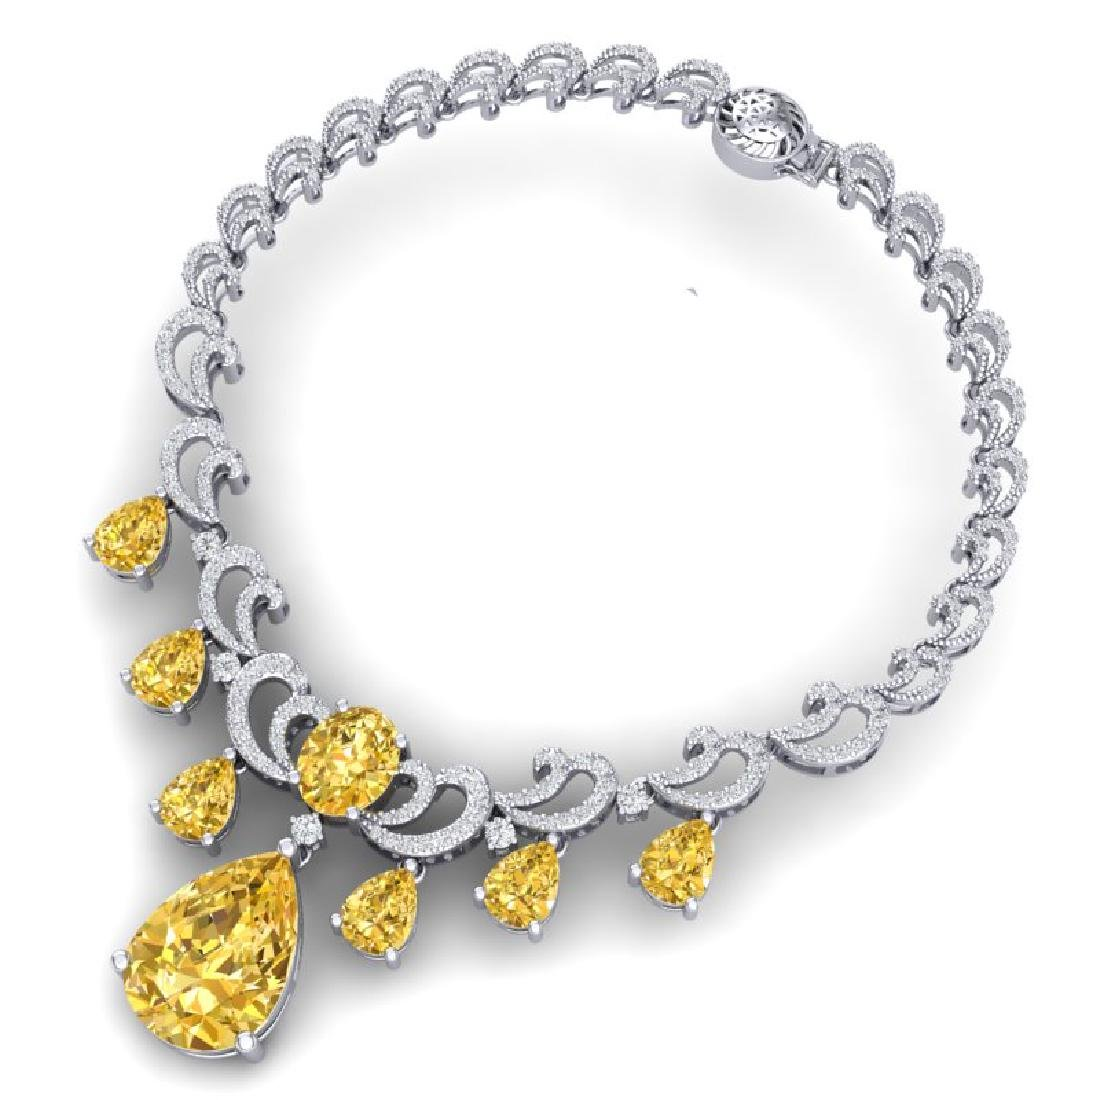 33.38 CTW Royalty Canary Citrine & VS Diamond Necklace - 3